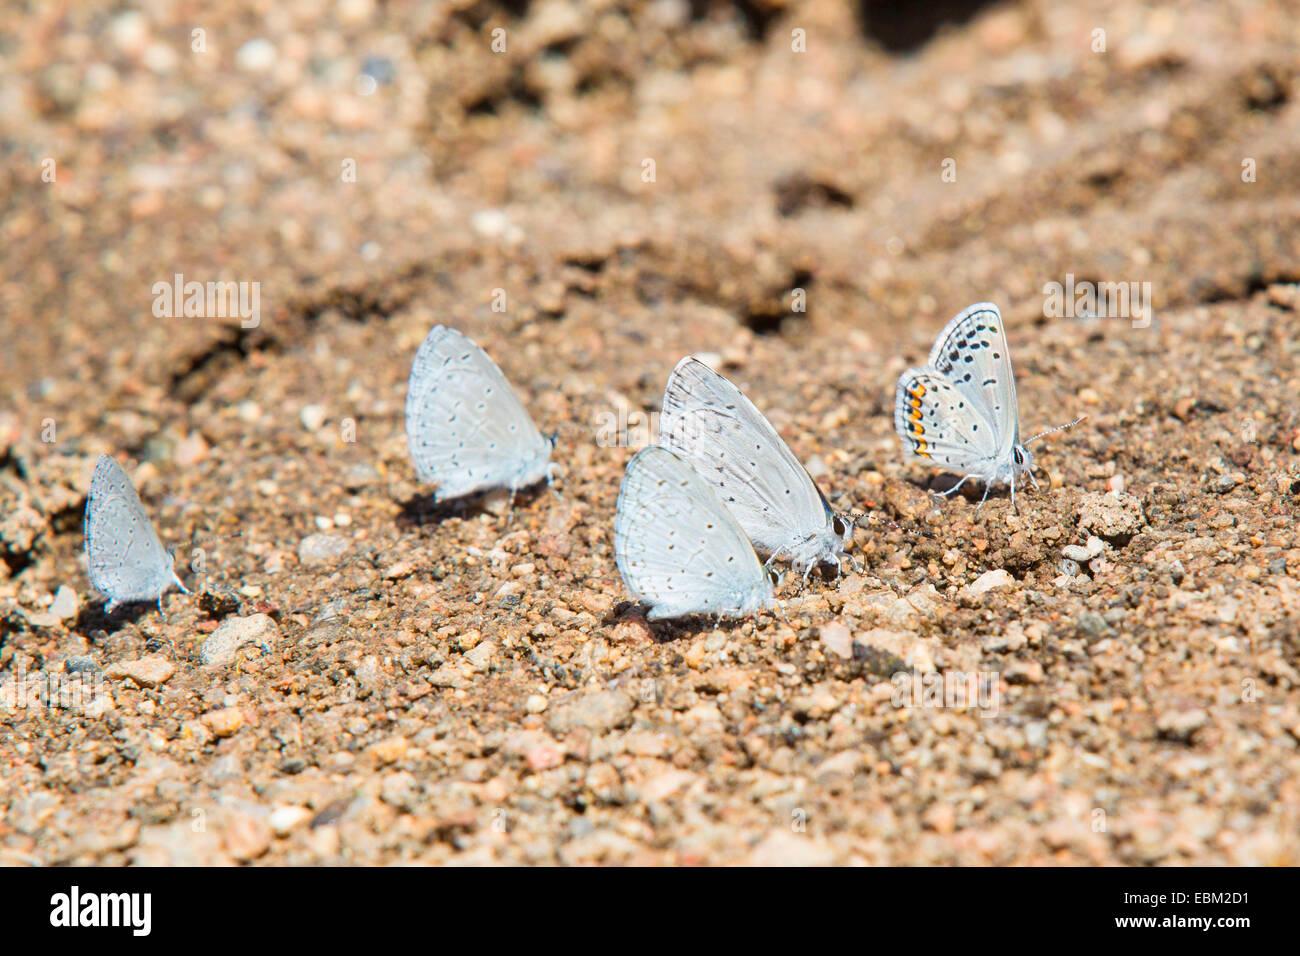 Holly Blue, Holly-Blue (Celastrina argiolus echo, Celestrina argiolus echo, Cyaniris argiolus echo, Lycaena argiolus - Stock Image